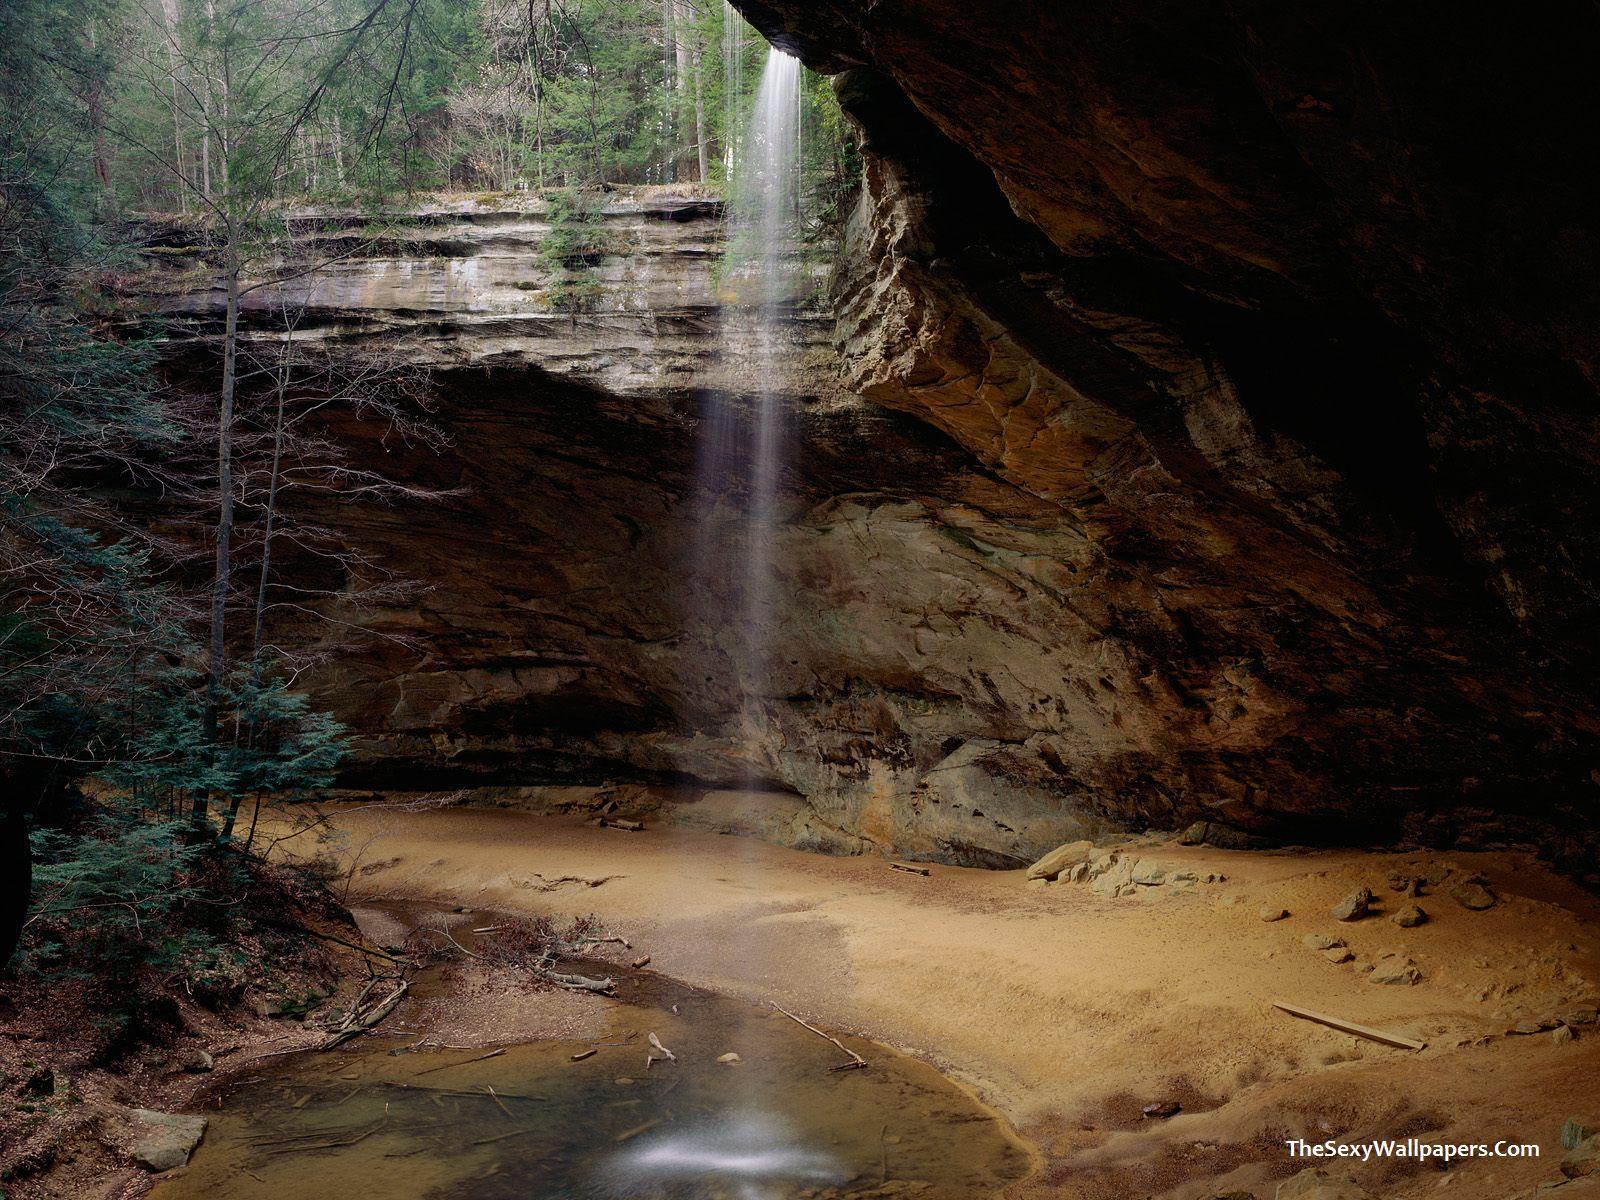 Download Waterfalls Wallpaper Ash Cave Ash Cave wallpapers 1600x1200